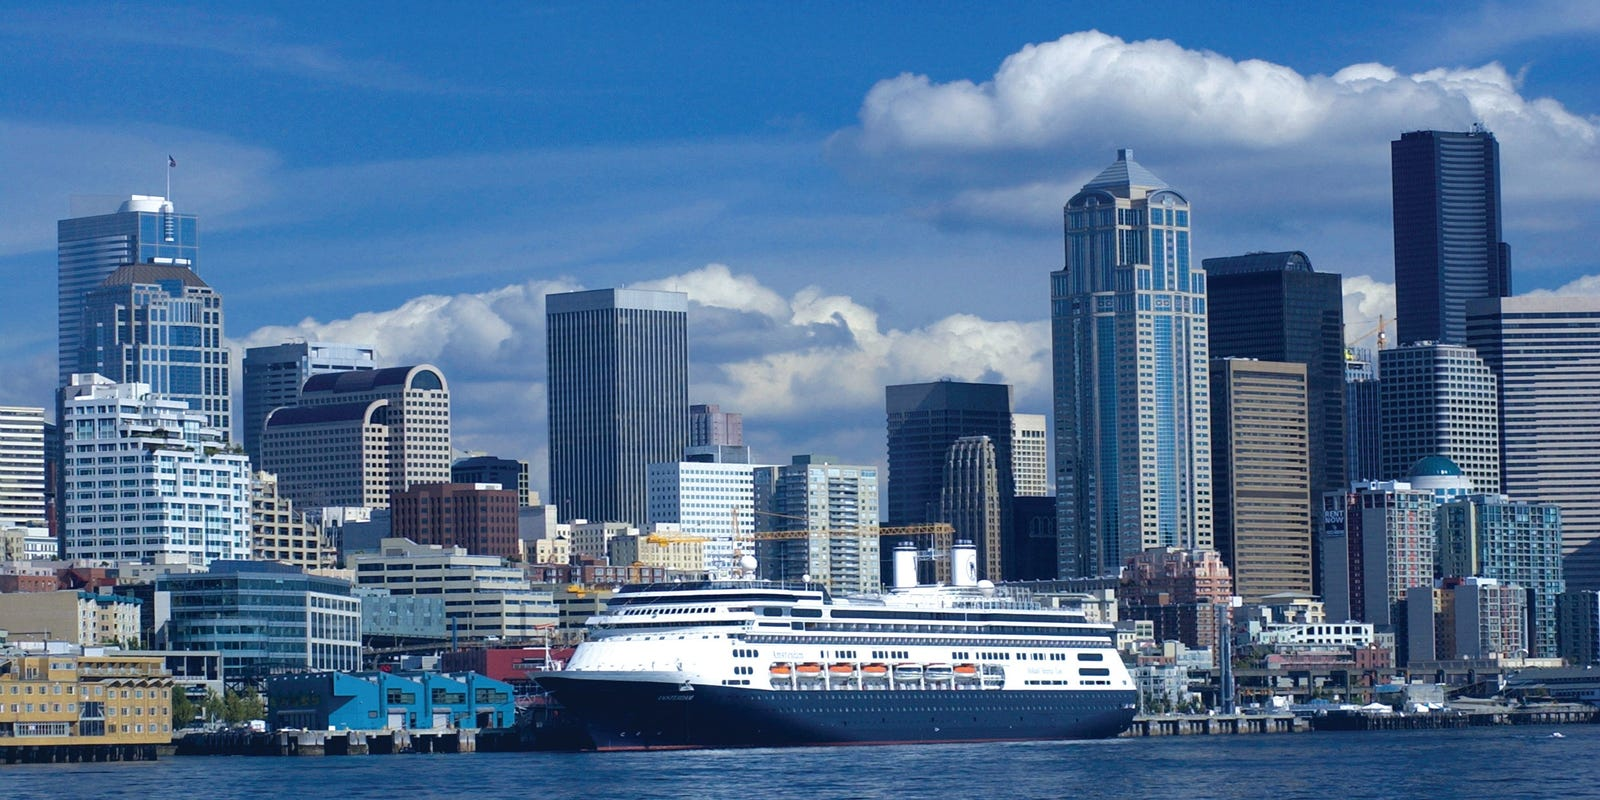 Carnival Corp. facing extra environmental hurdle before its ships can sail, per court order